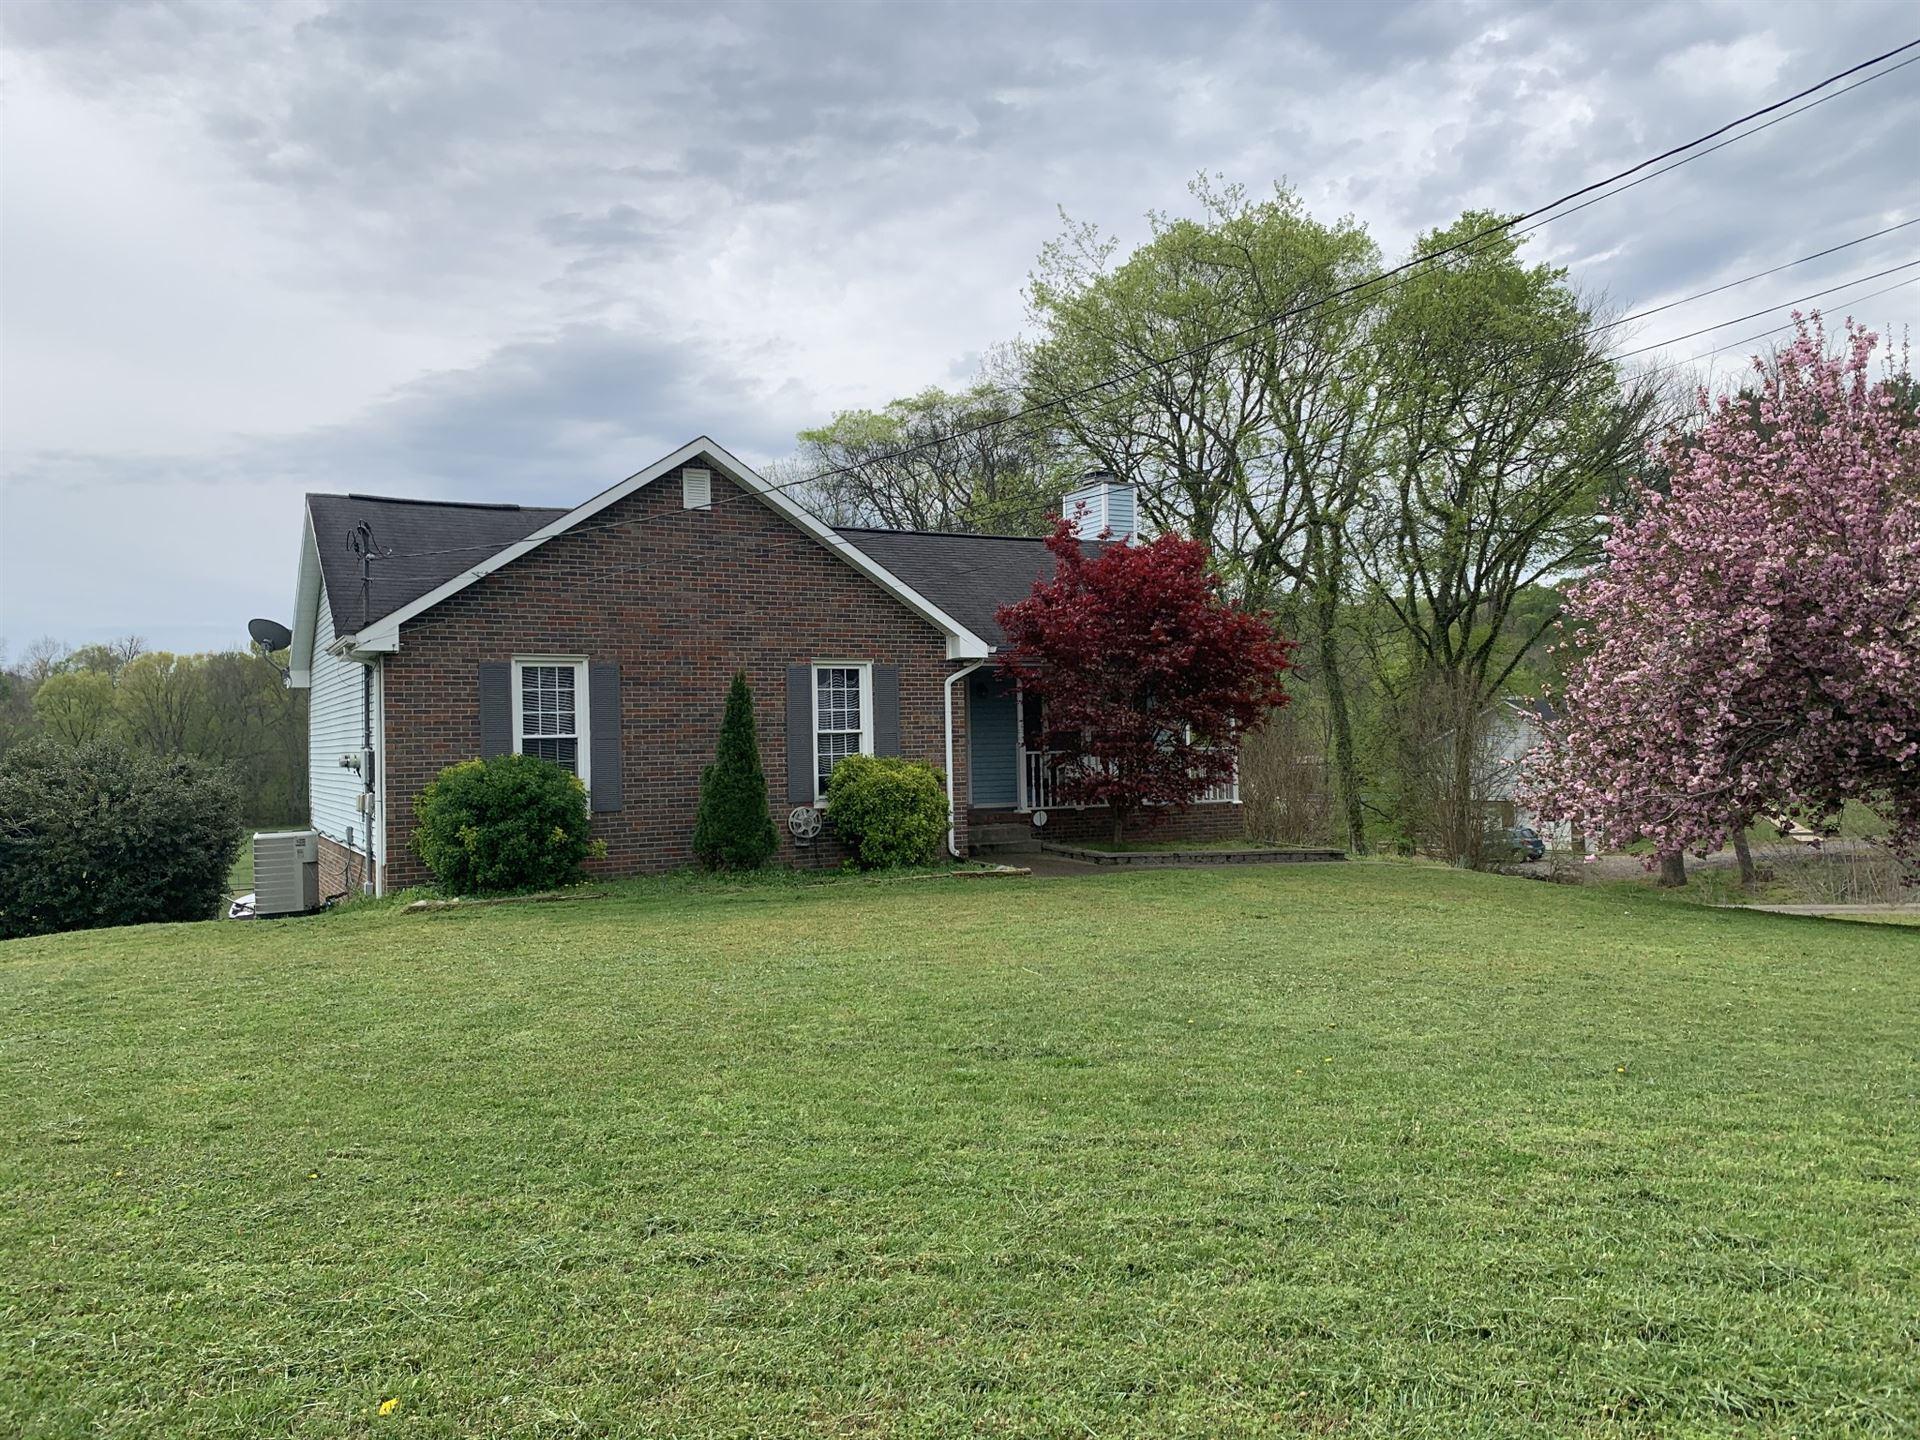 Photo of 1402 McClardy Rd, Clarksville, TN 37042 (MLS # 2243532)